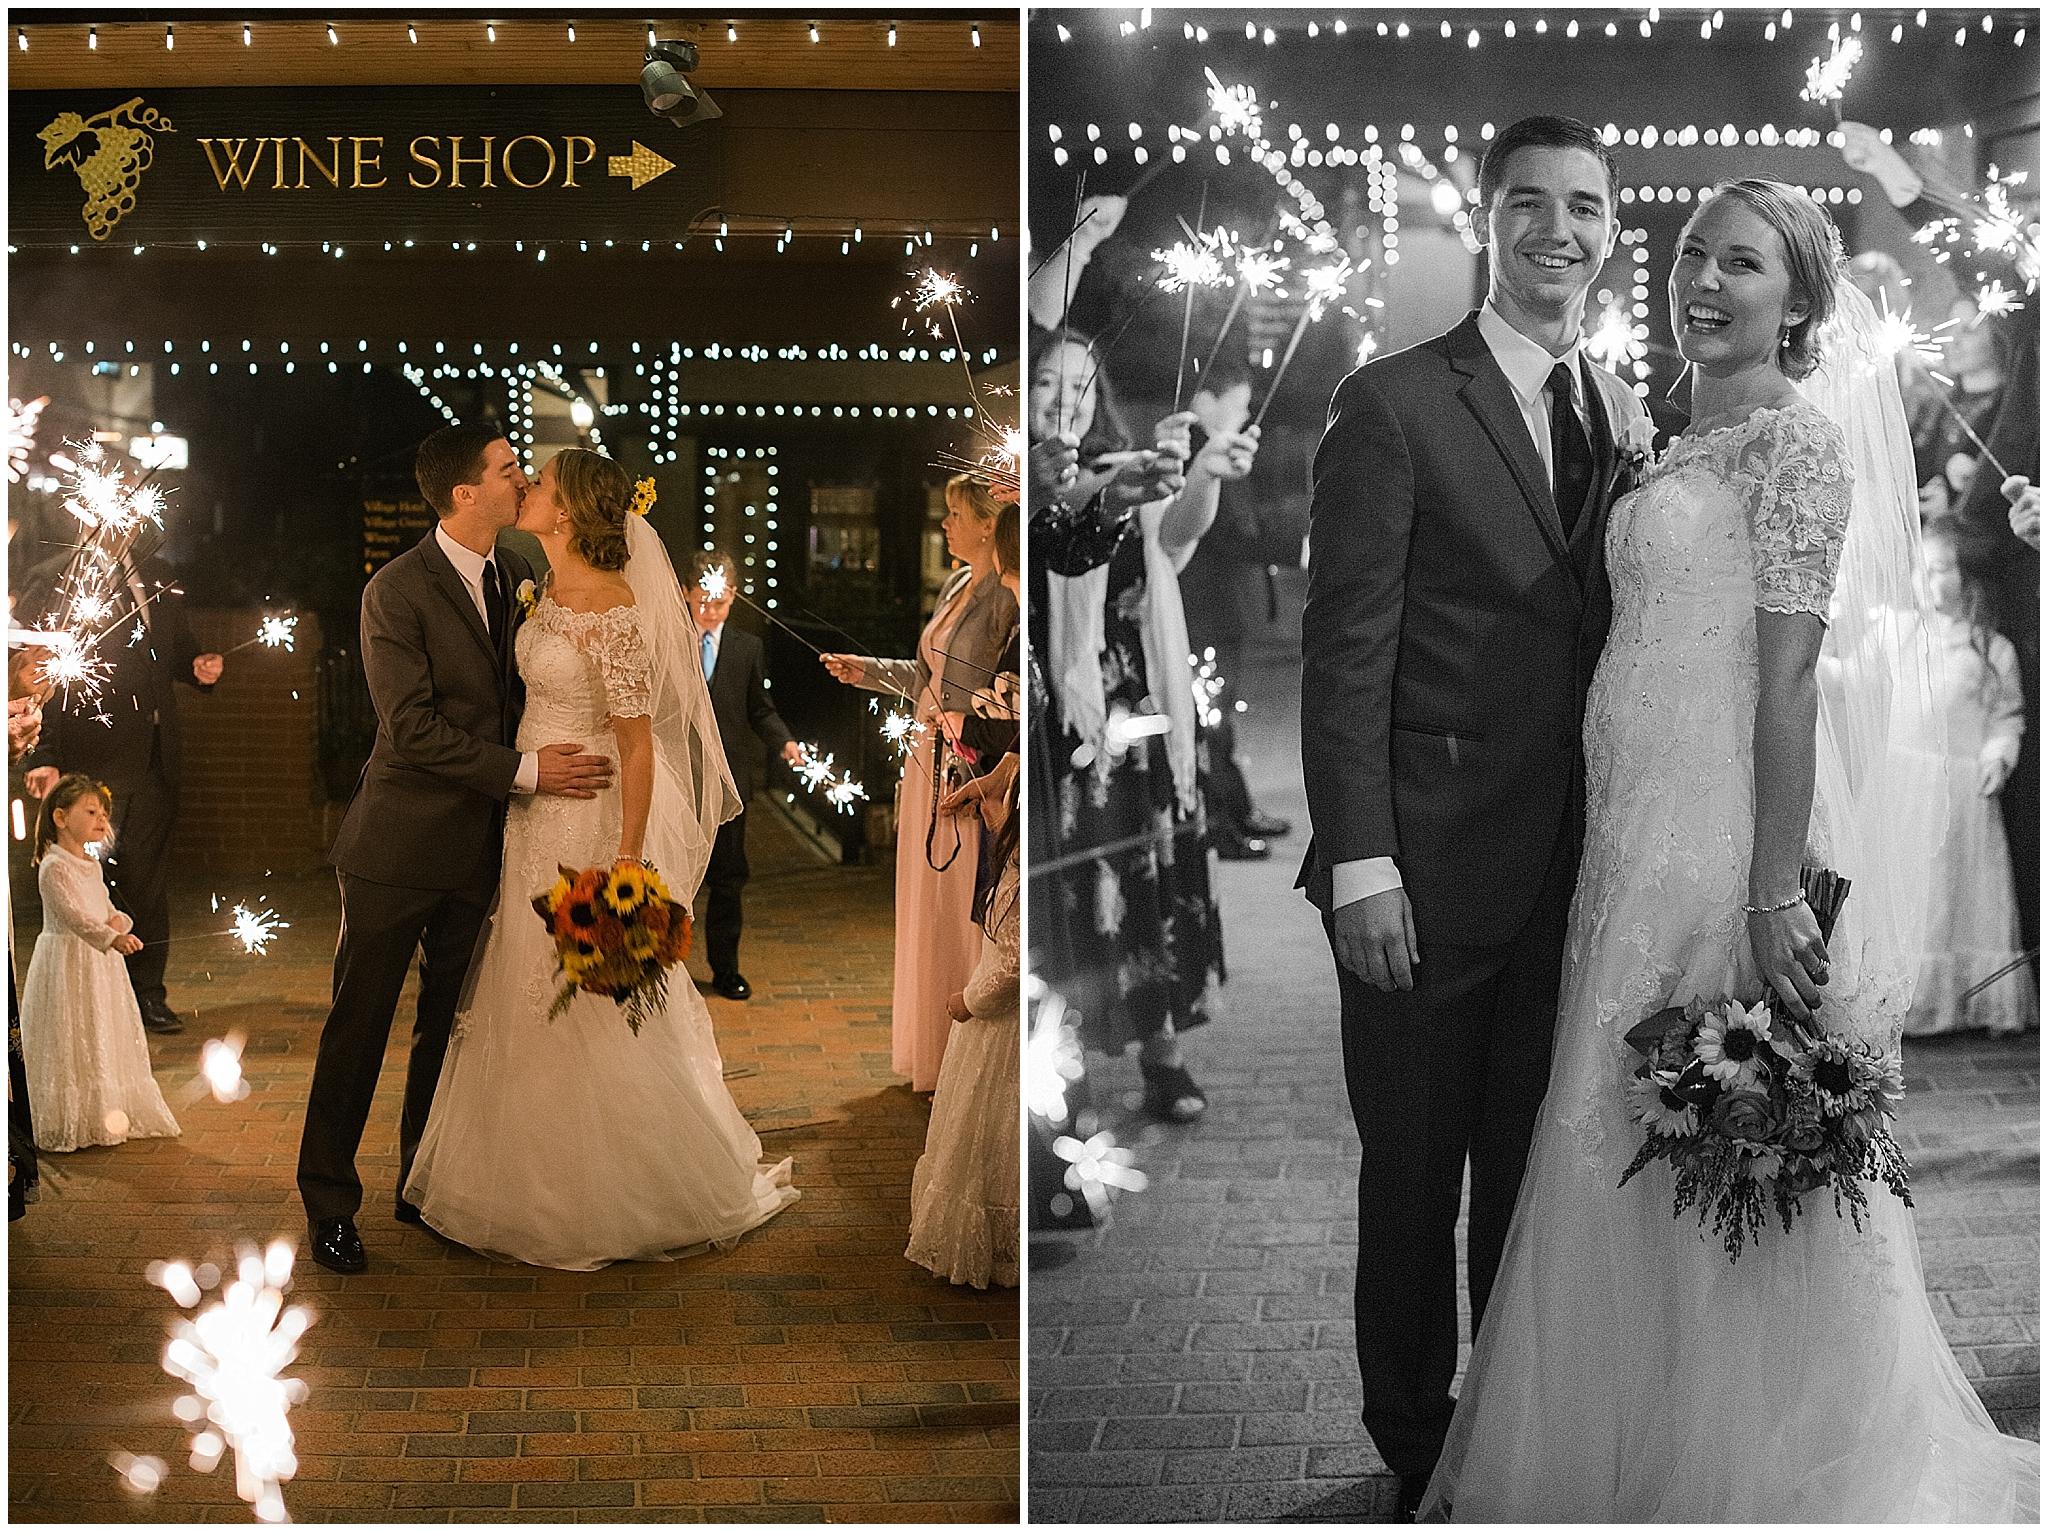 Biltmore_Wedding_Reception_Wine_Cellar_Asheville_Photographer-10.jpg